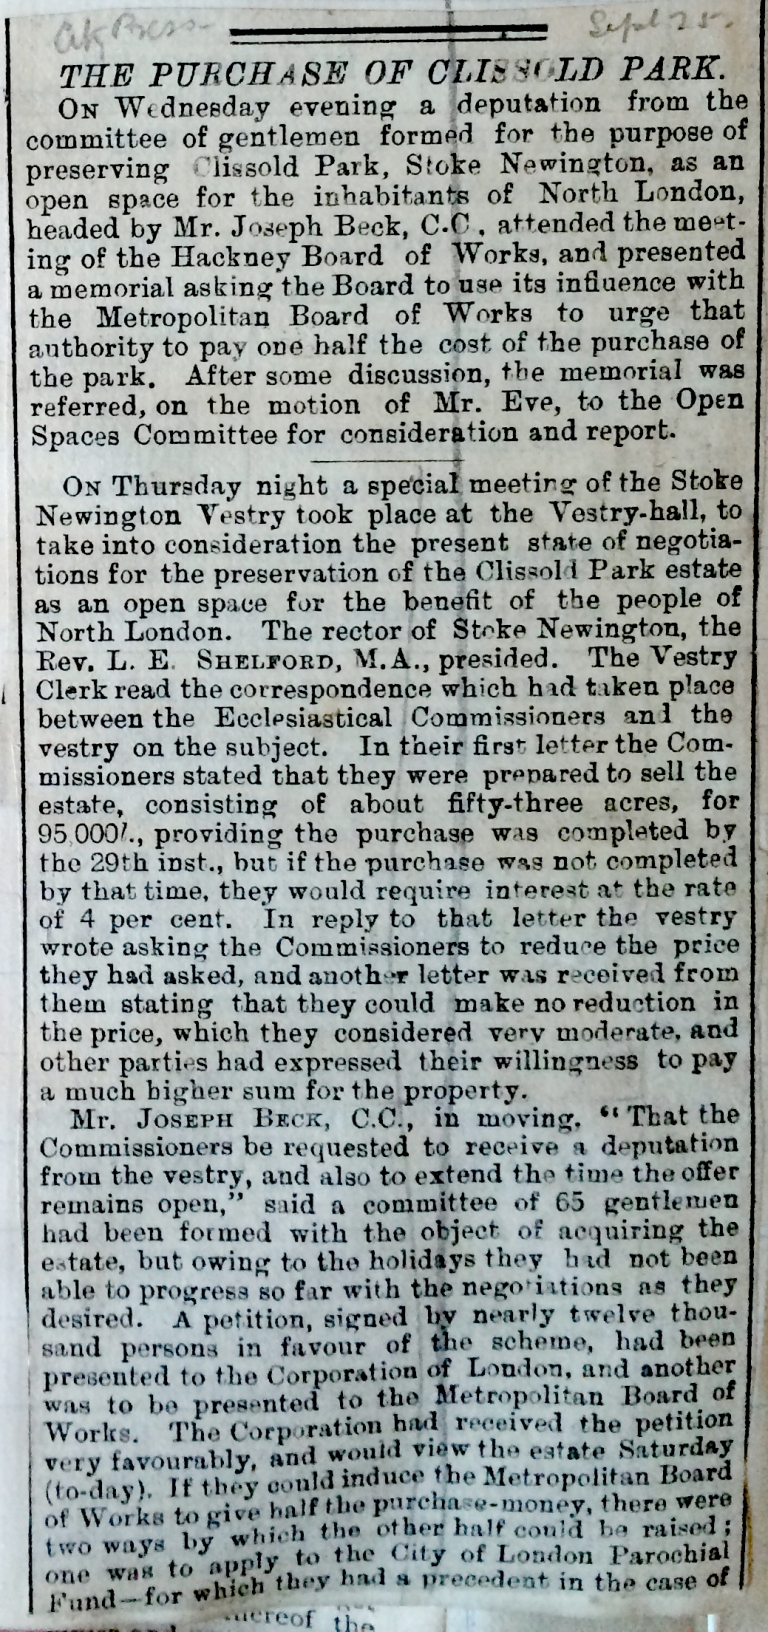 25_09_1886 NEWS CLIPPING Hackney Board of Works.JPG